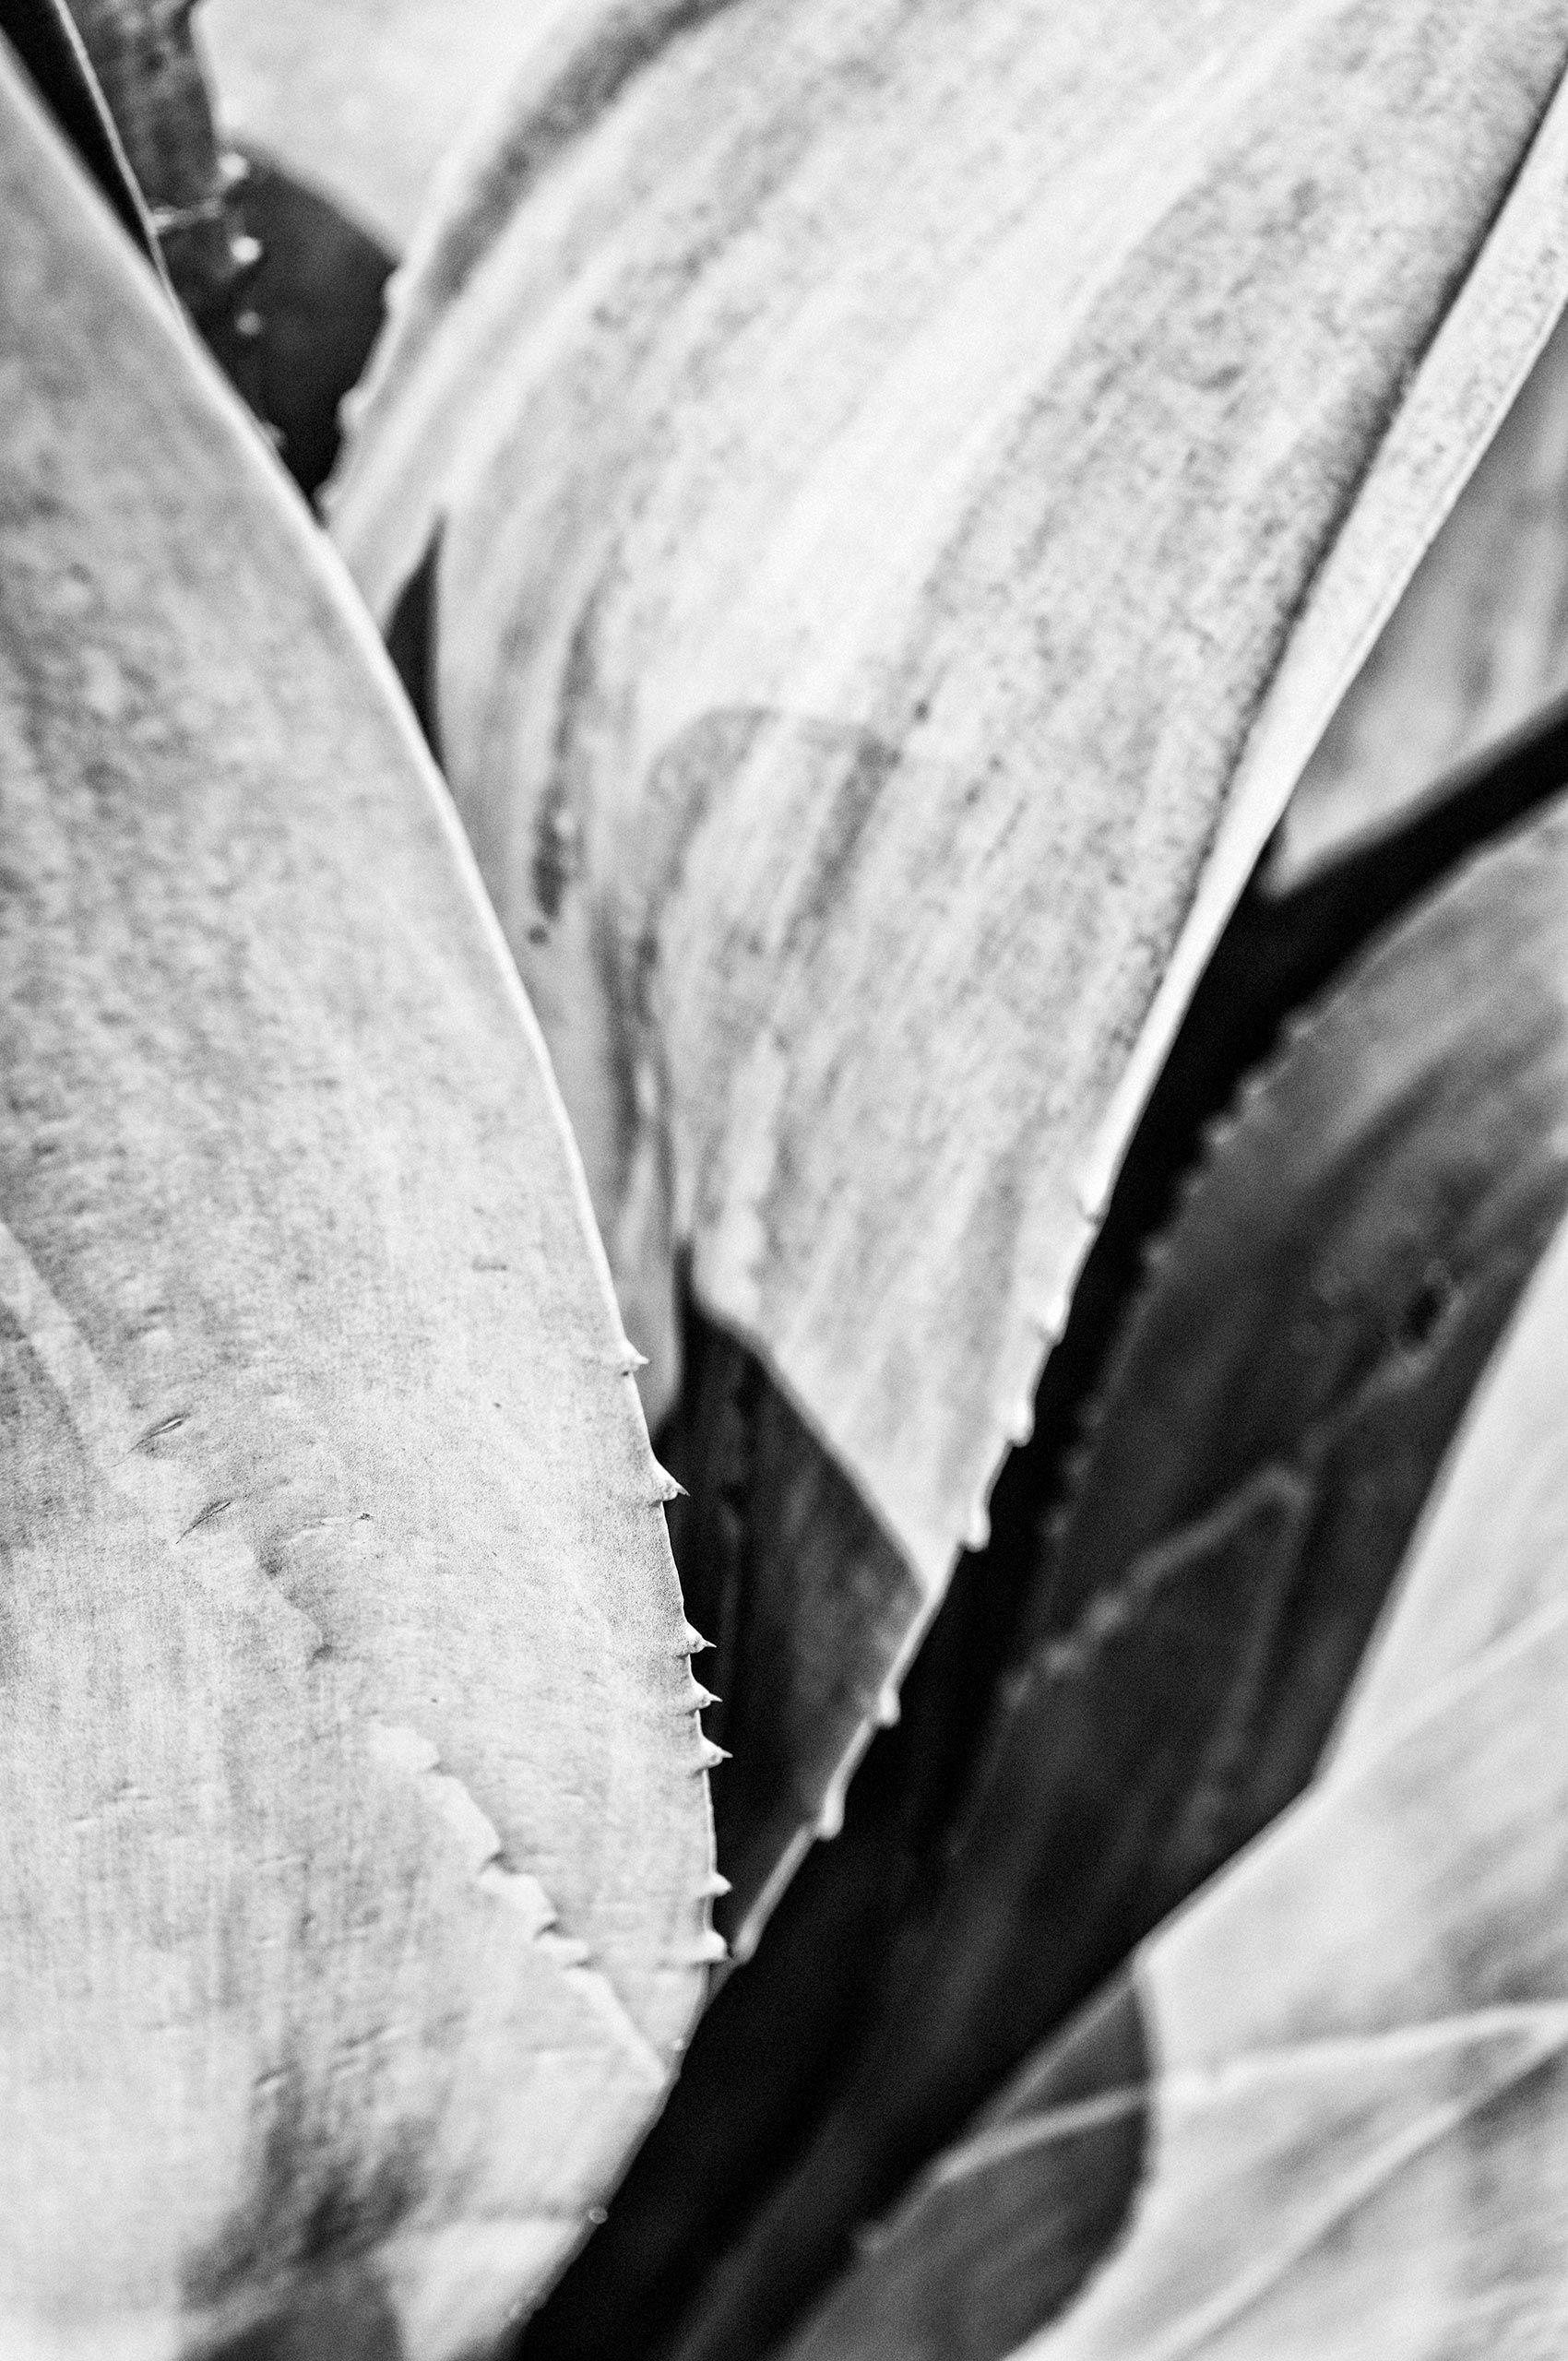 cactus-symmetry-HenrikOlundPhotography.jpg